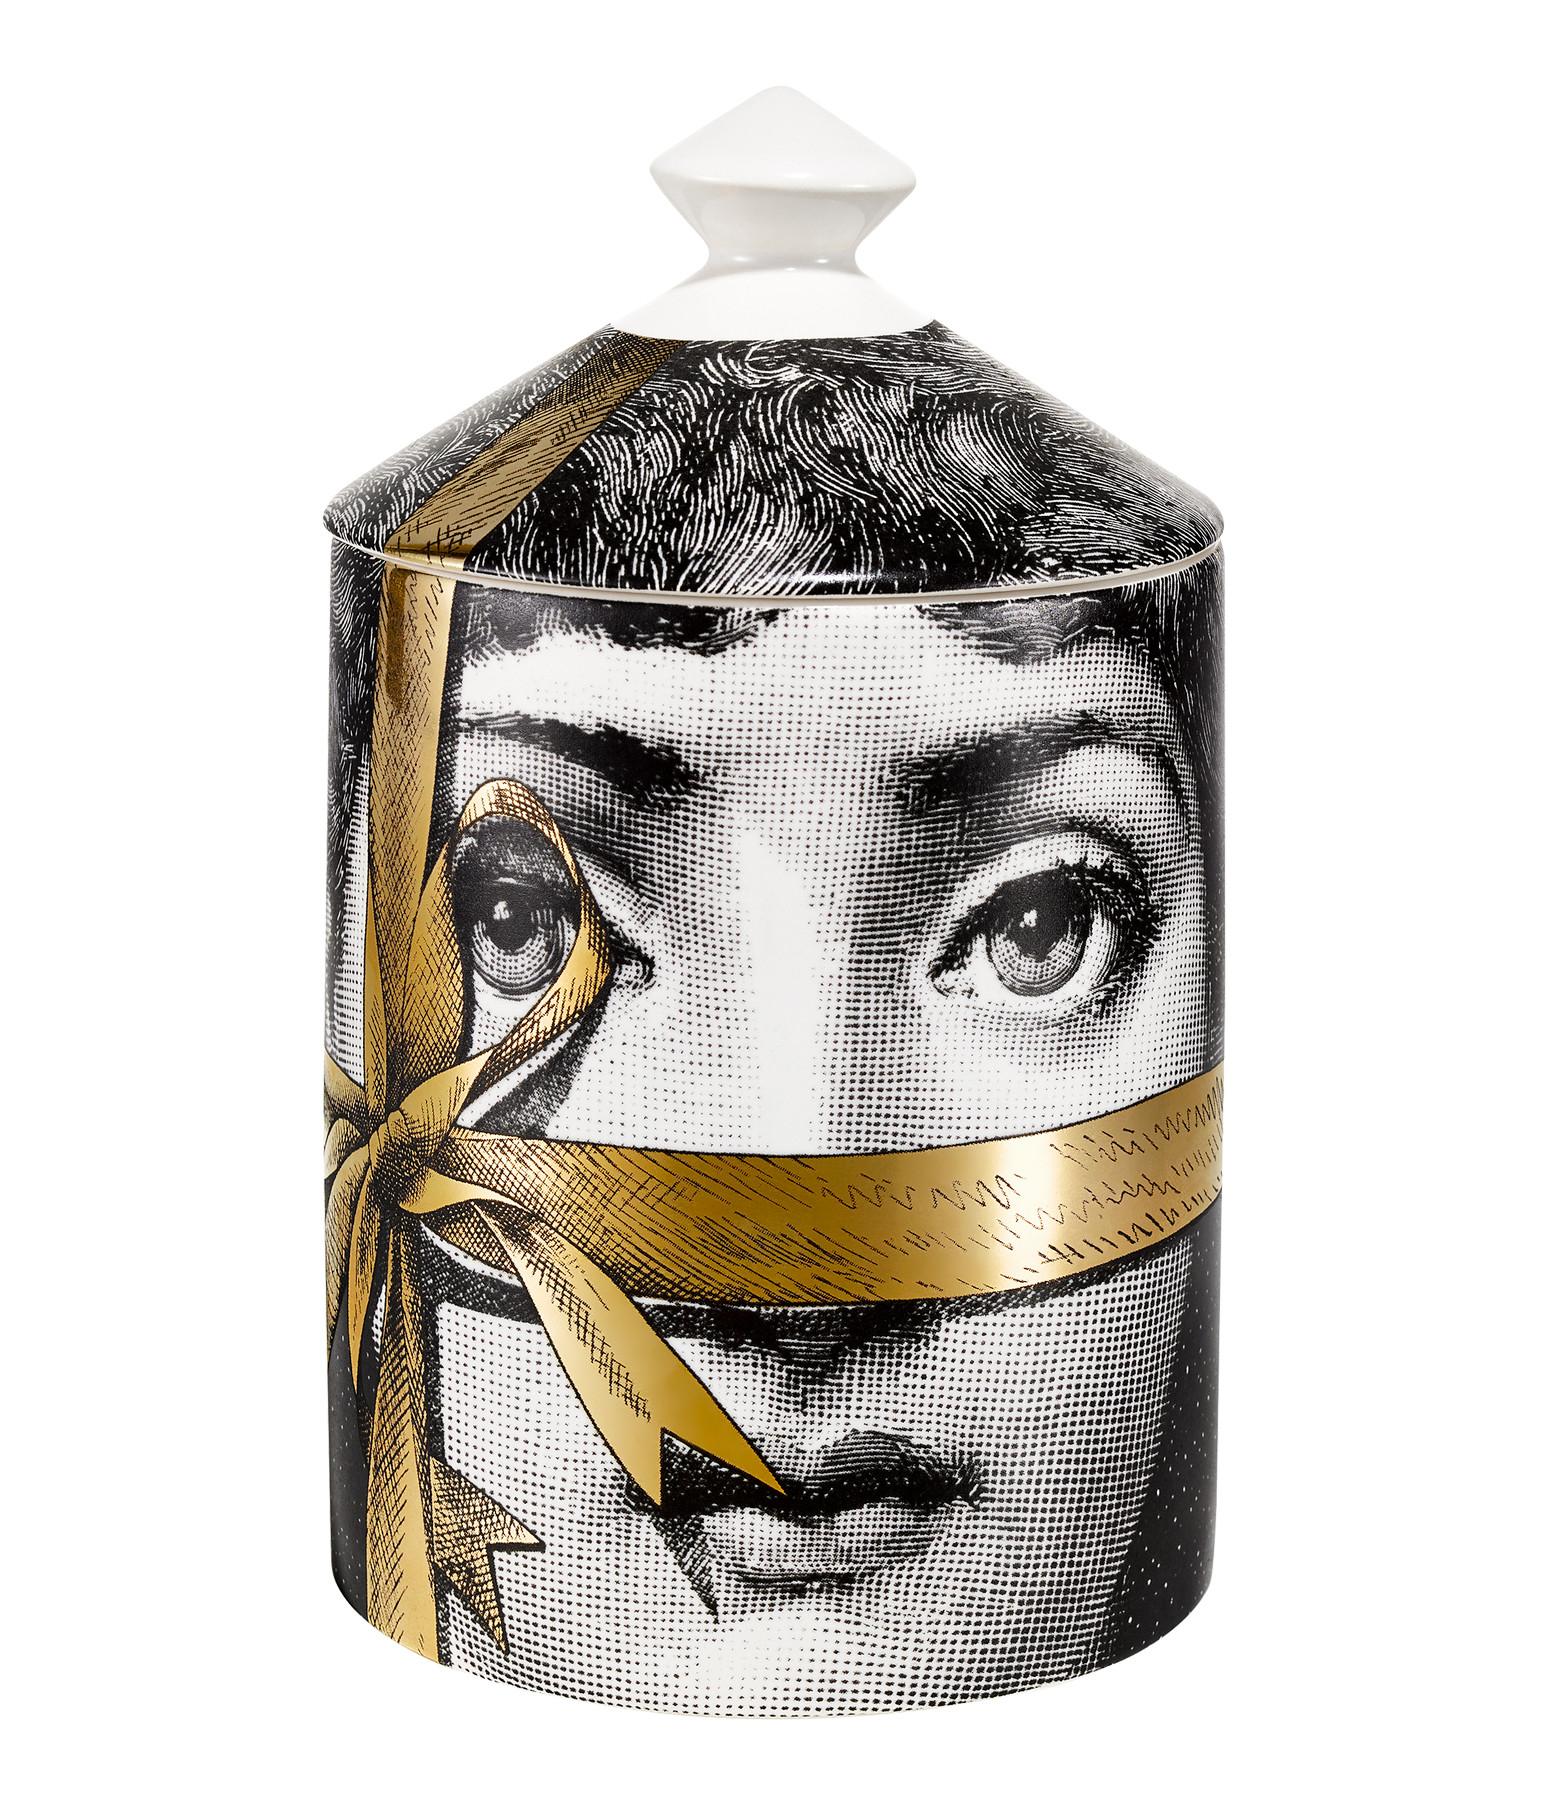 FORNASETTI - Bougie Parfumée 300g Regalo Doré